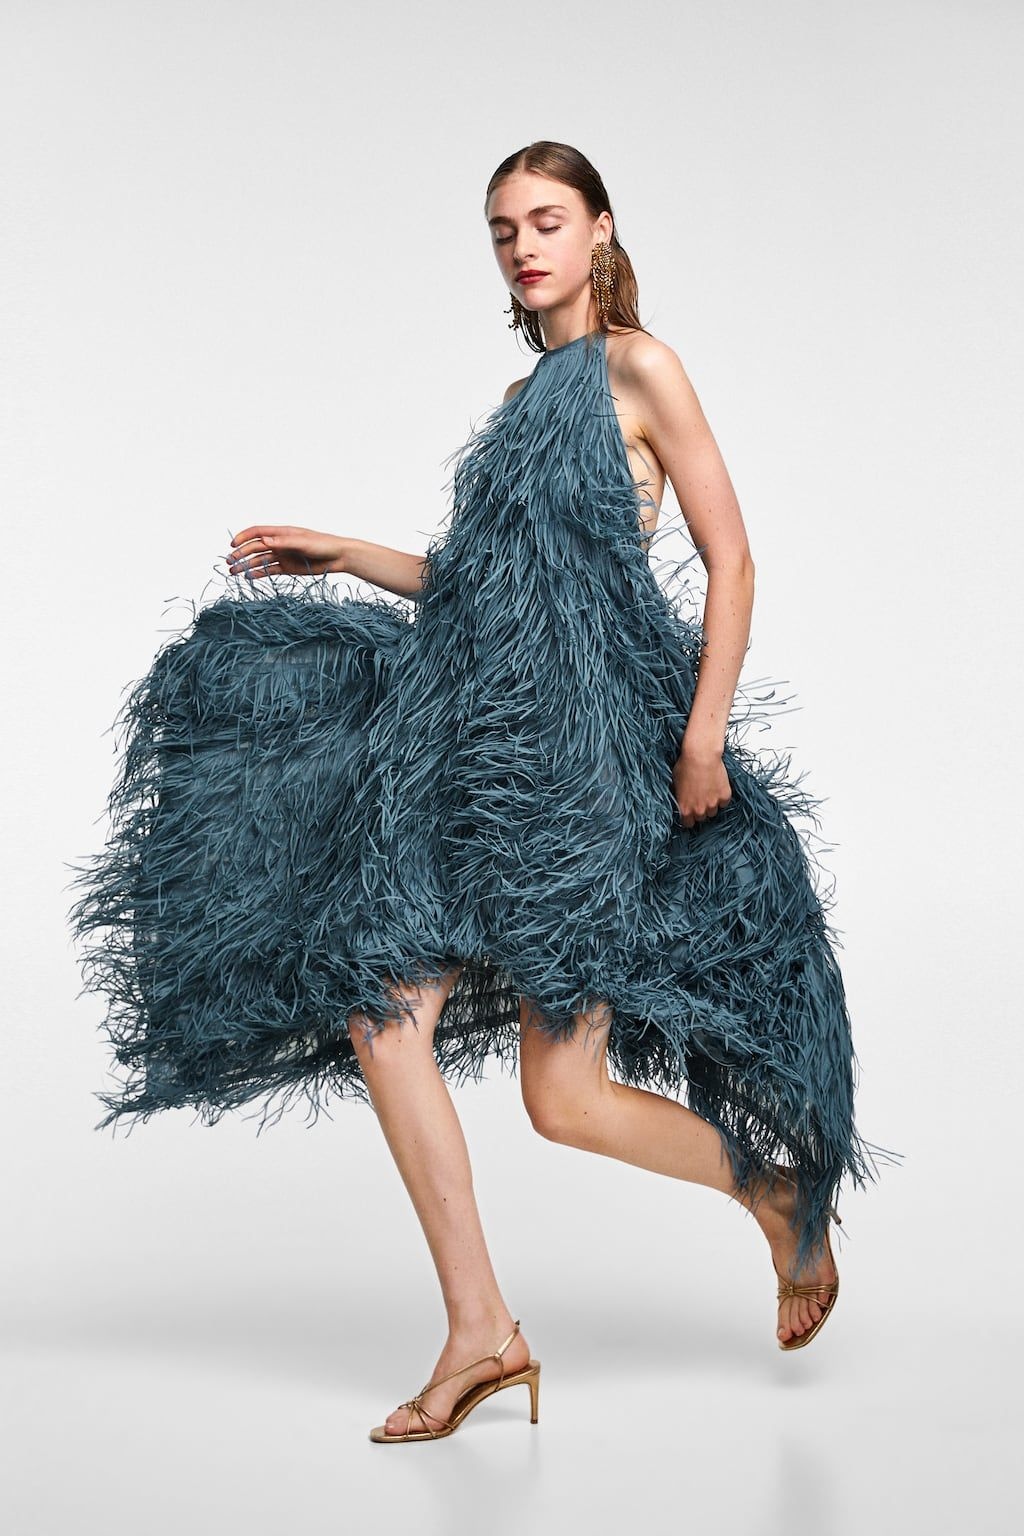 Zara Halter Dress with Fringe CHARCOAL GRAY   9/9